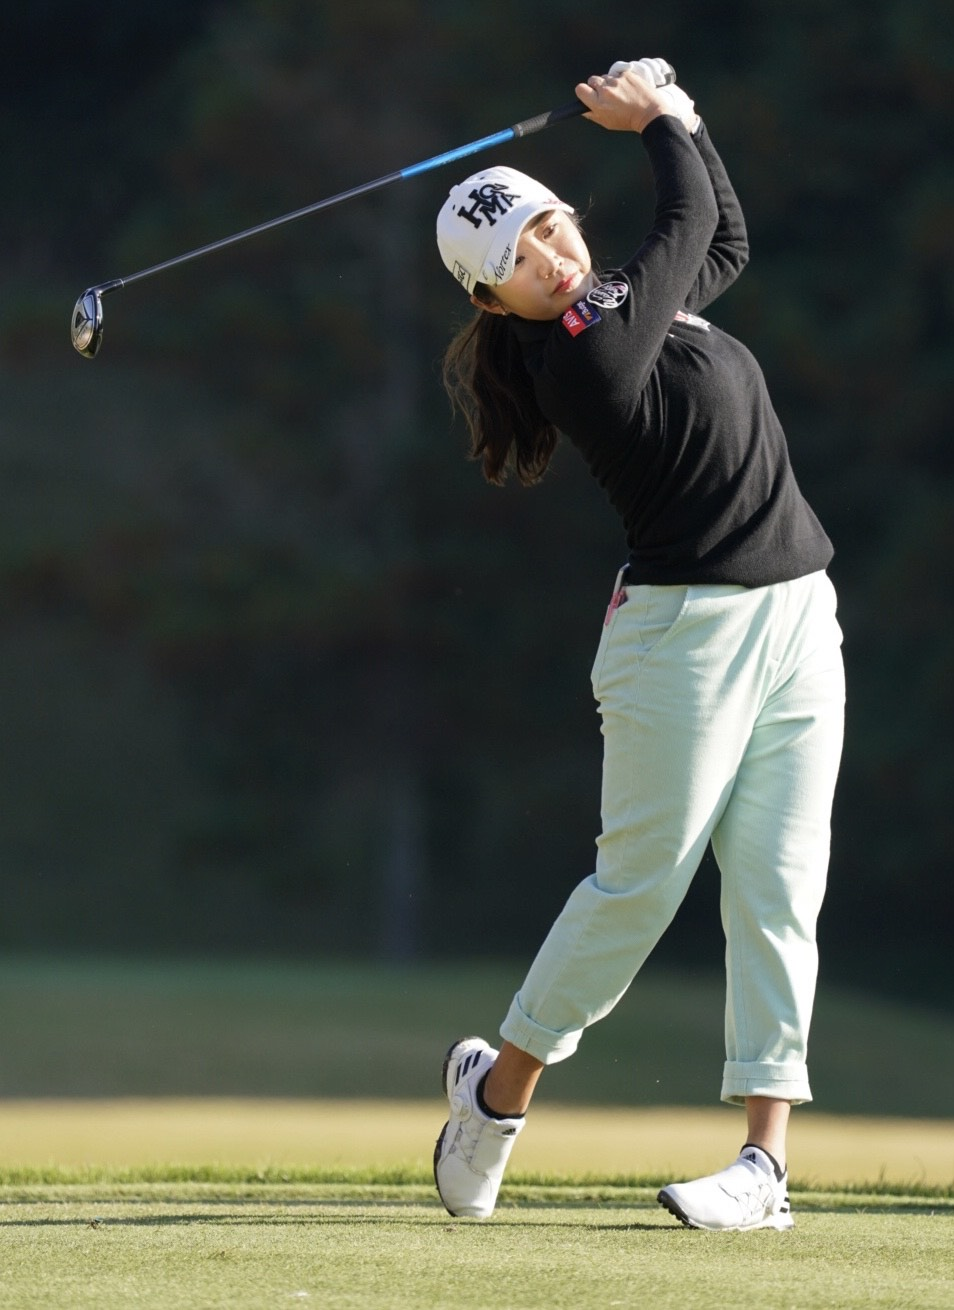 https://www.nikkansports.com/sports/golf/news/img/202011130000066-w1300_14.jpg